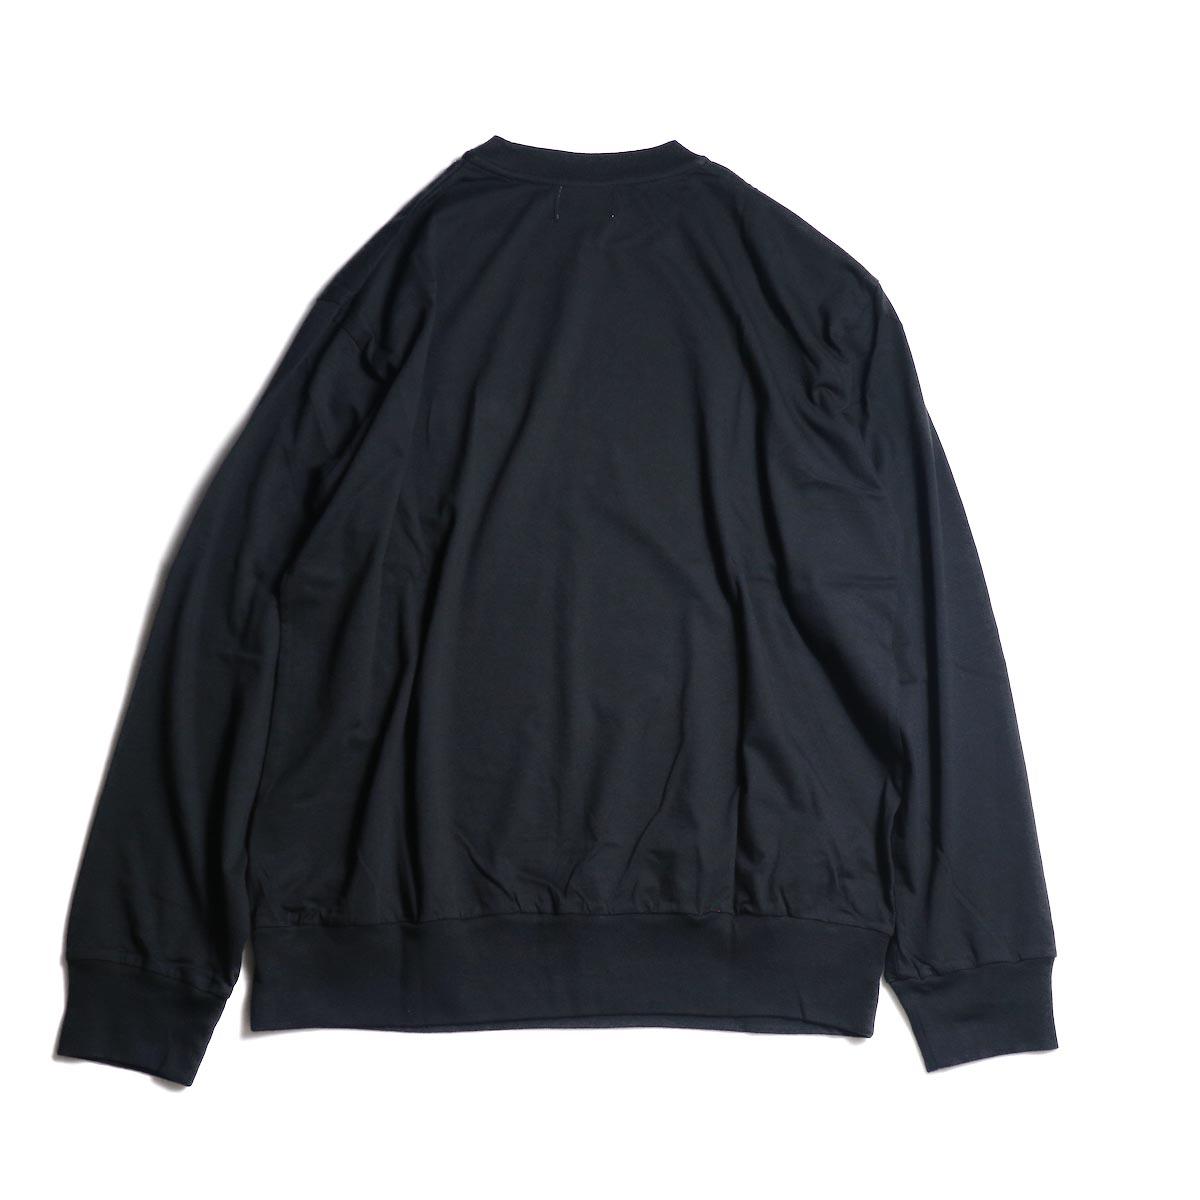 blurhms / Silk Cotton Jersey L/S P/O Loose Fit (Black)背面